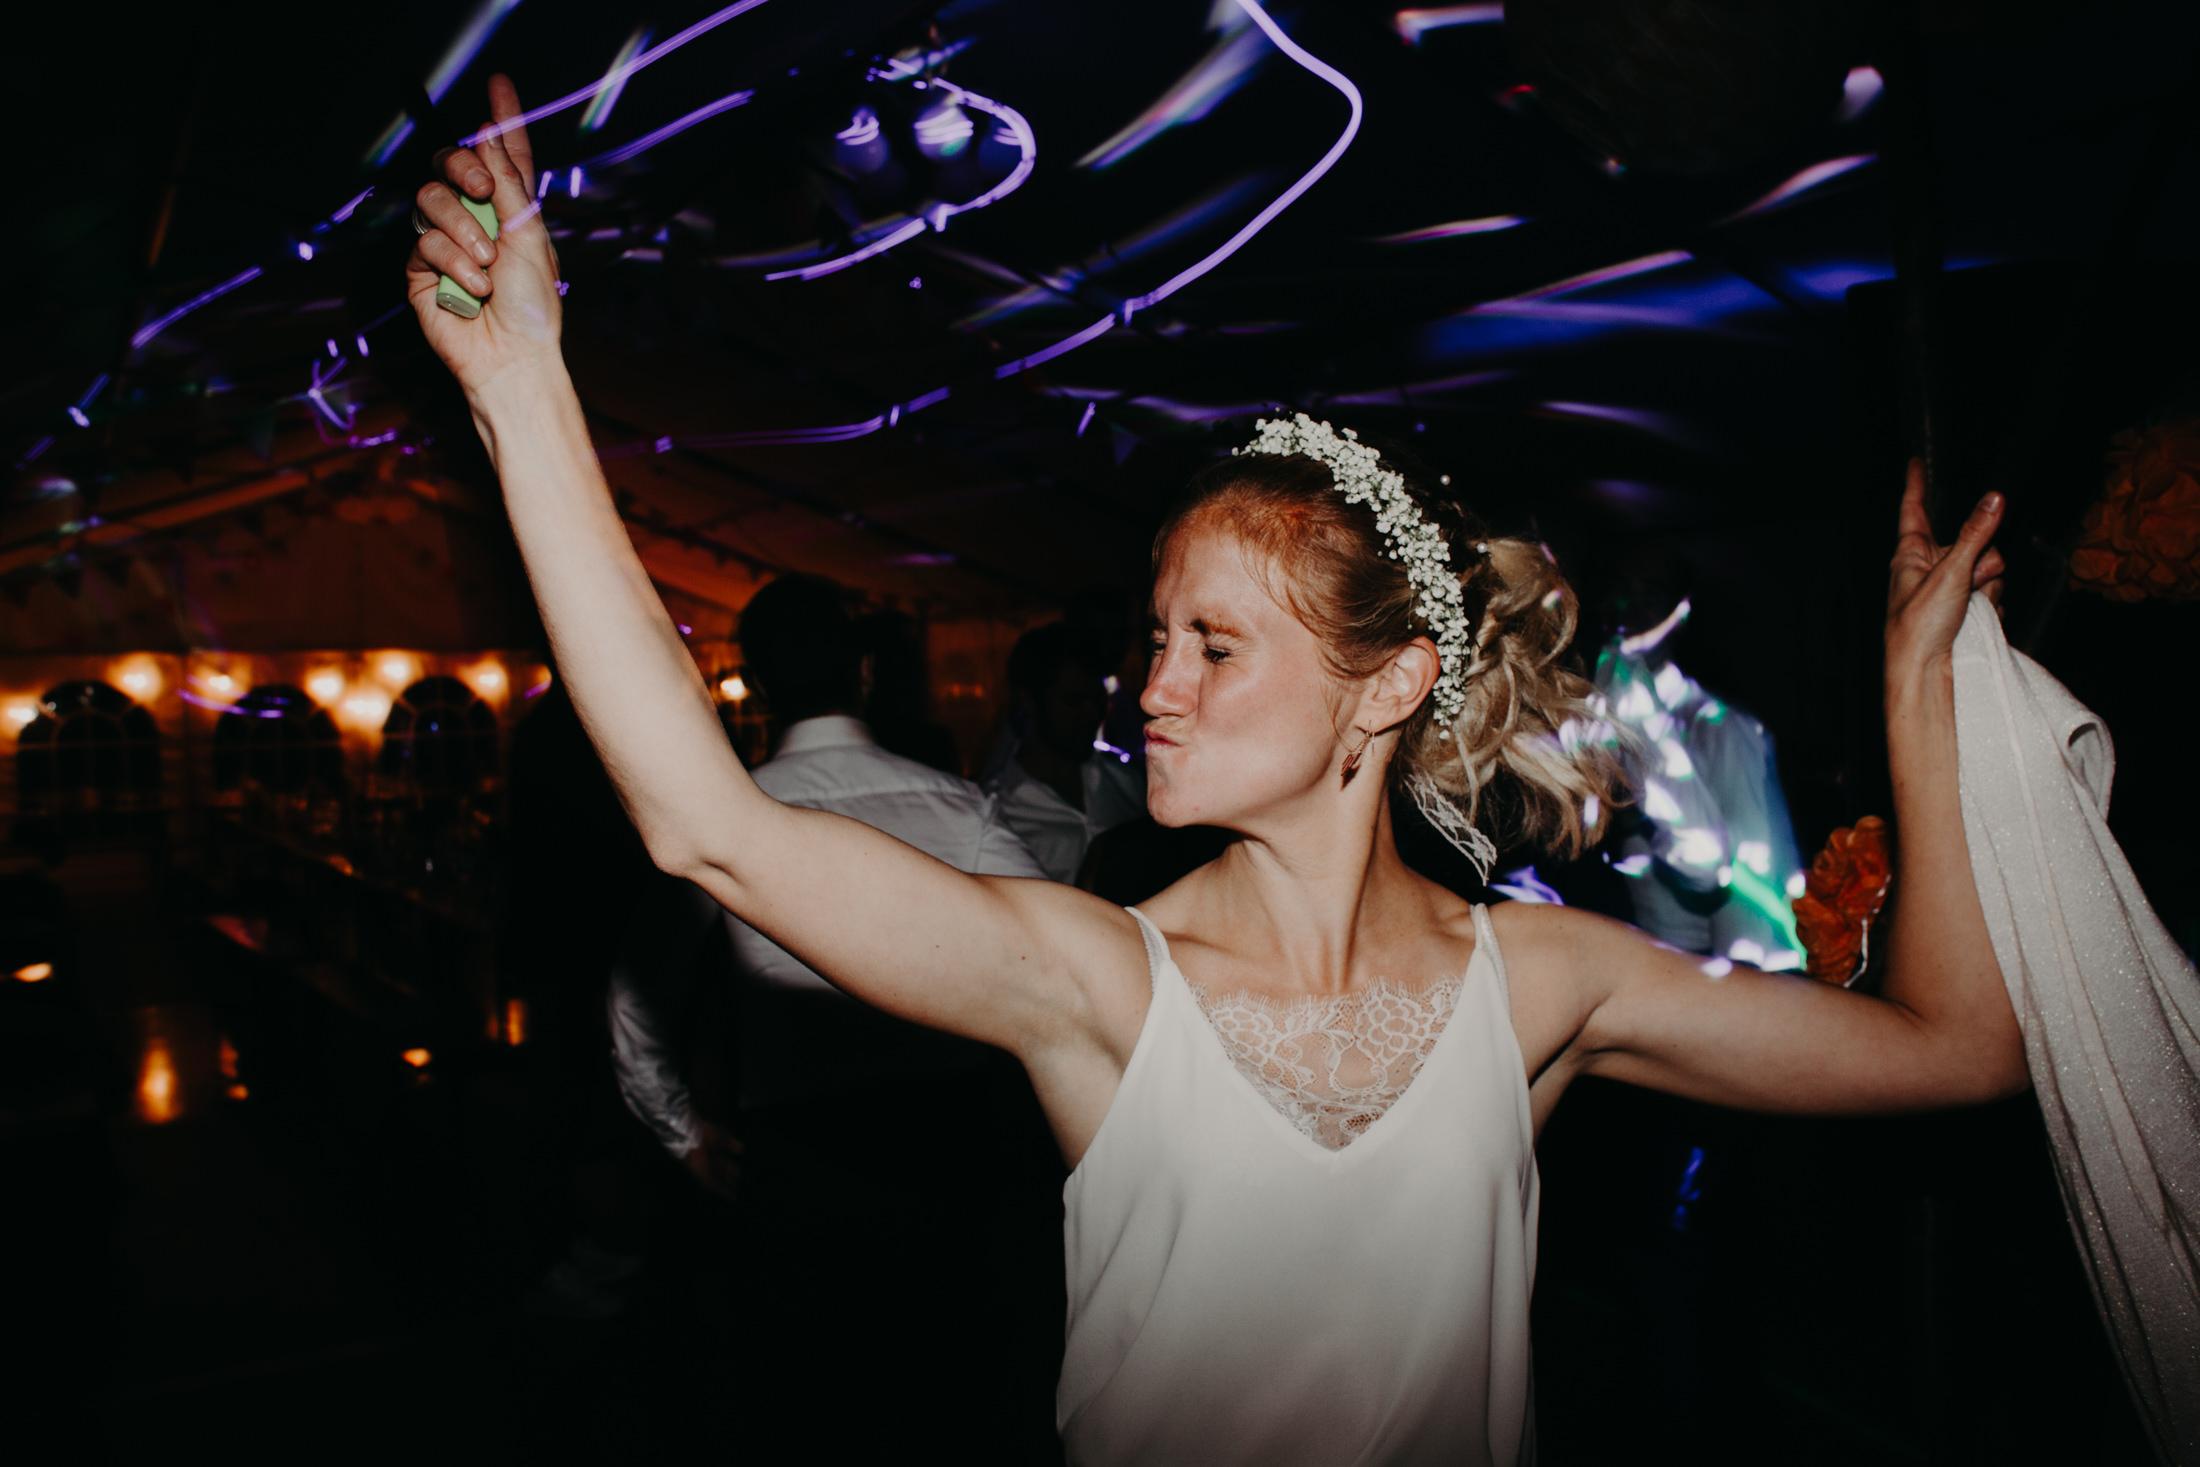 Mariage alsace germany wedding kid-85.jpg